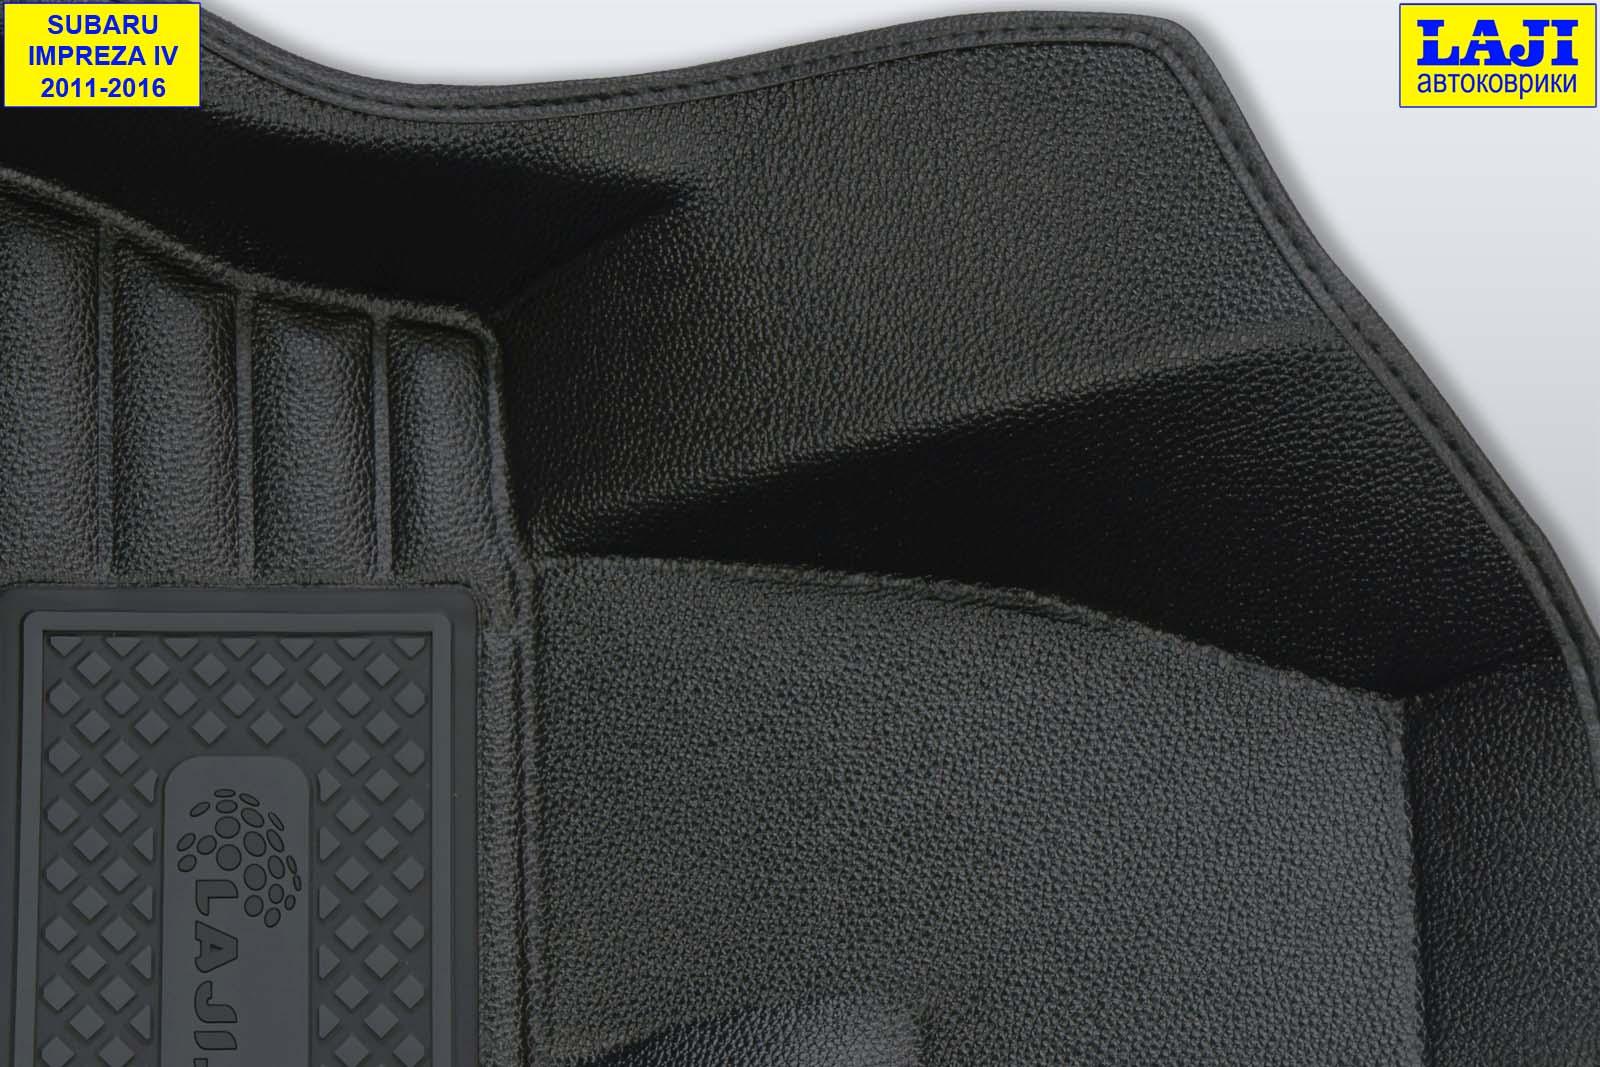 5D коврики в салон Subaru Impreza 4 2011-2016 6